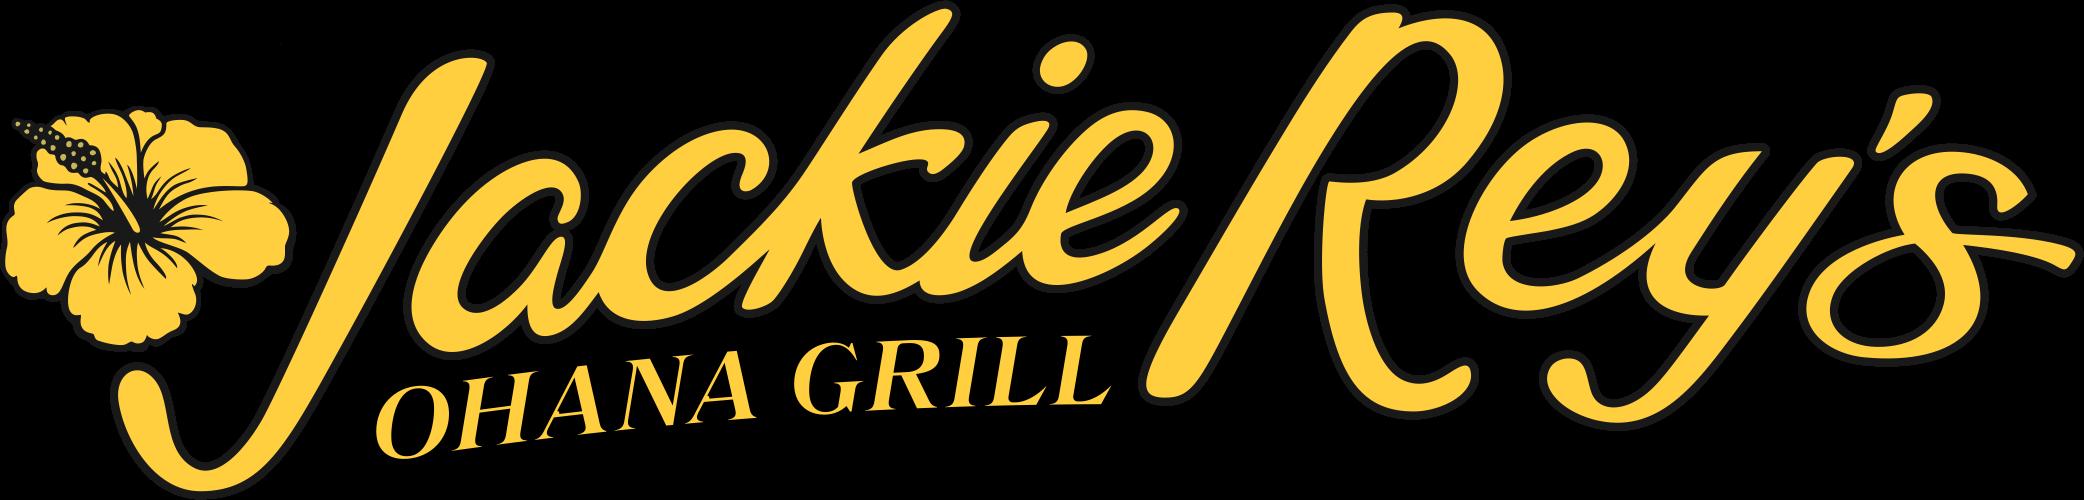 JR-logo-gold-and-black.png